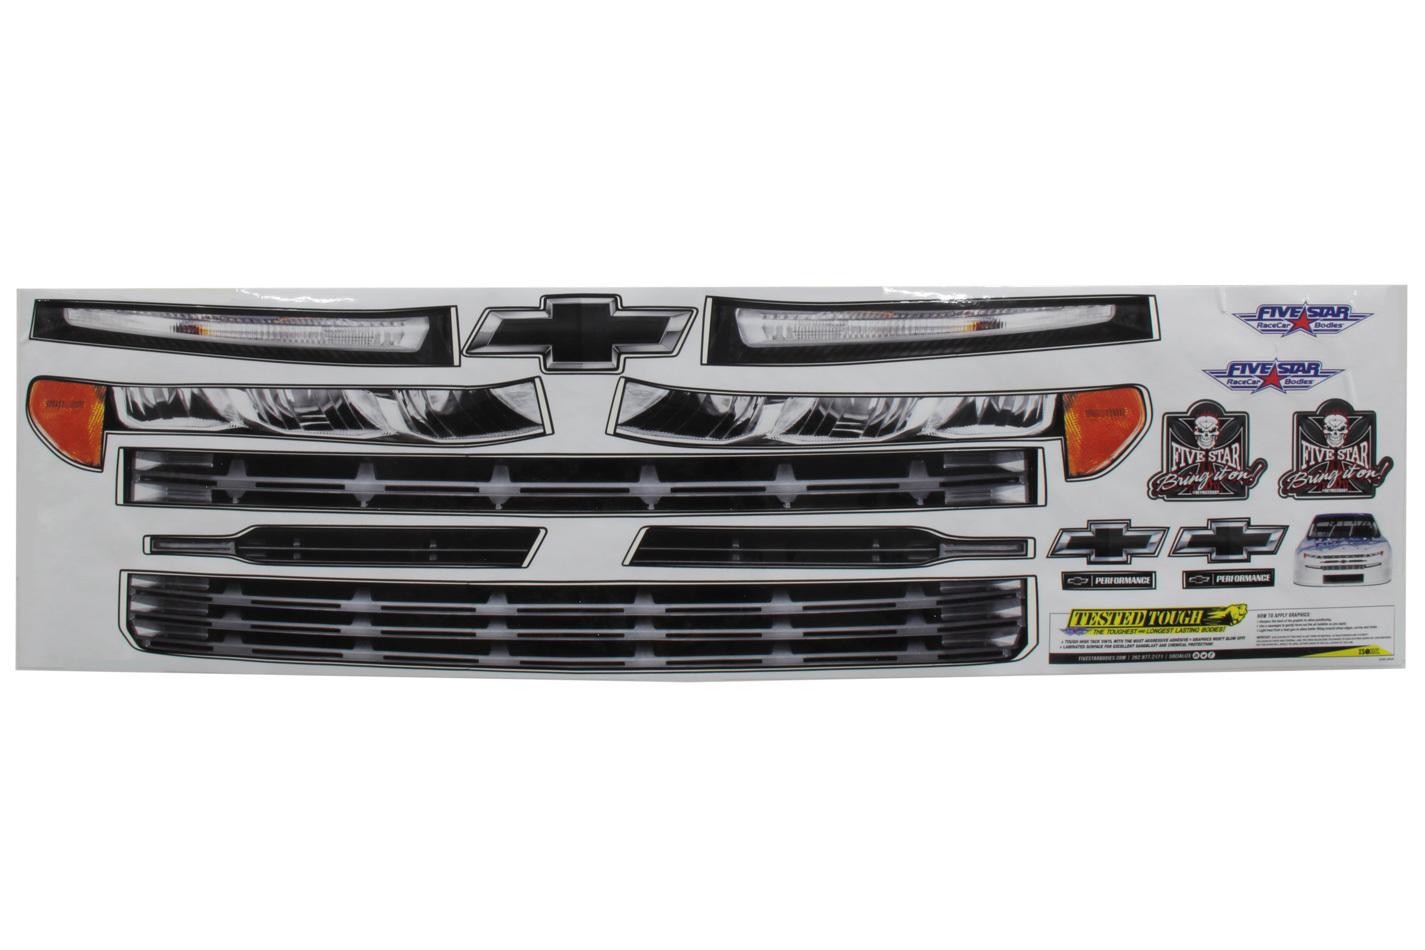 Fivestar 2019 Chevy Silverado Nose ID Graphics Kit